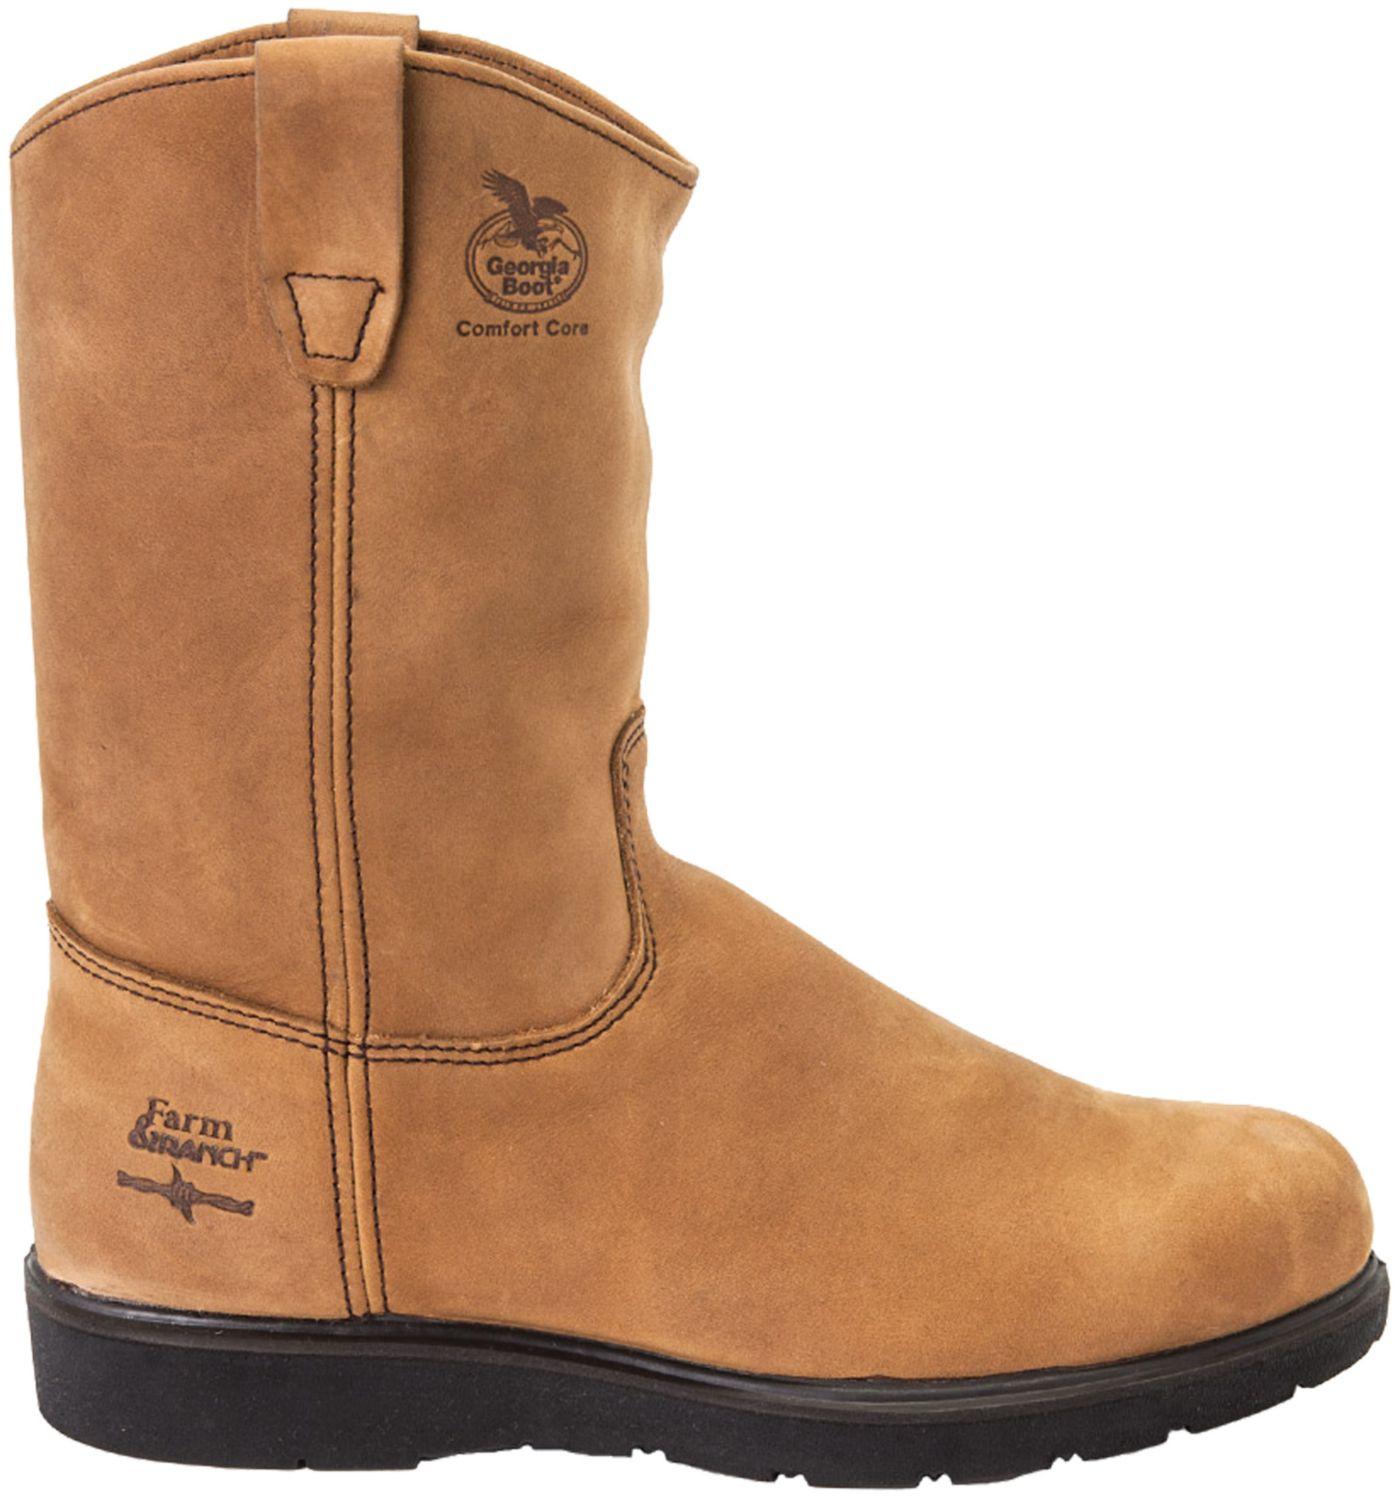 Georgia Boot Men's Farm & Ranch Wellington Comfort Core Work Boots